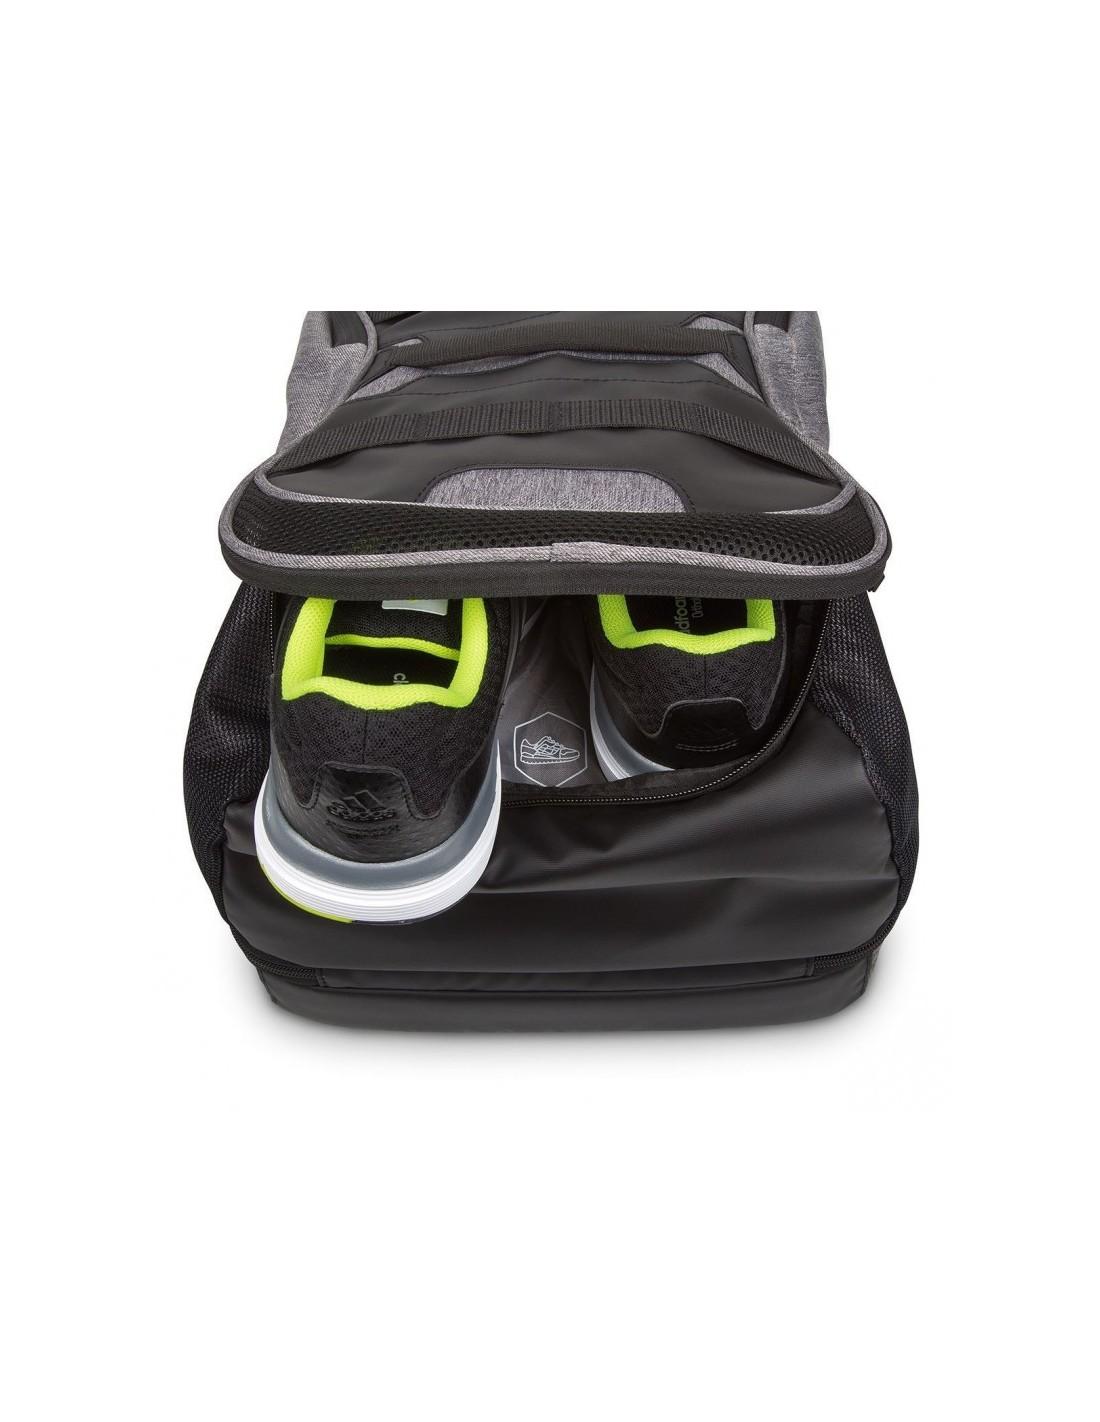 sac dos targus multisports pour pc portable 15 6 gris tsb94404eu 70. Black Bedroom Furniture Sets. Home Design Ideas